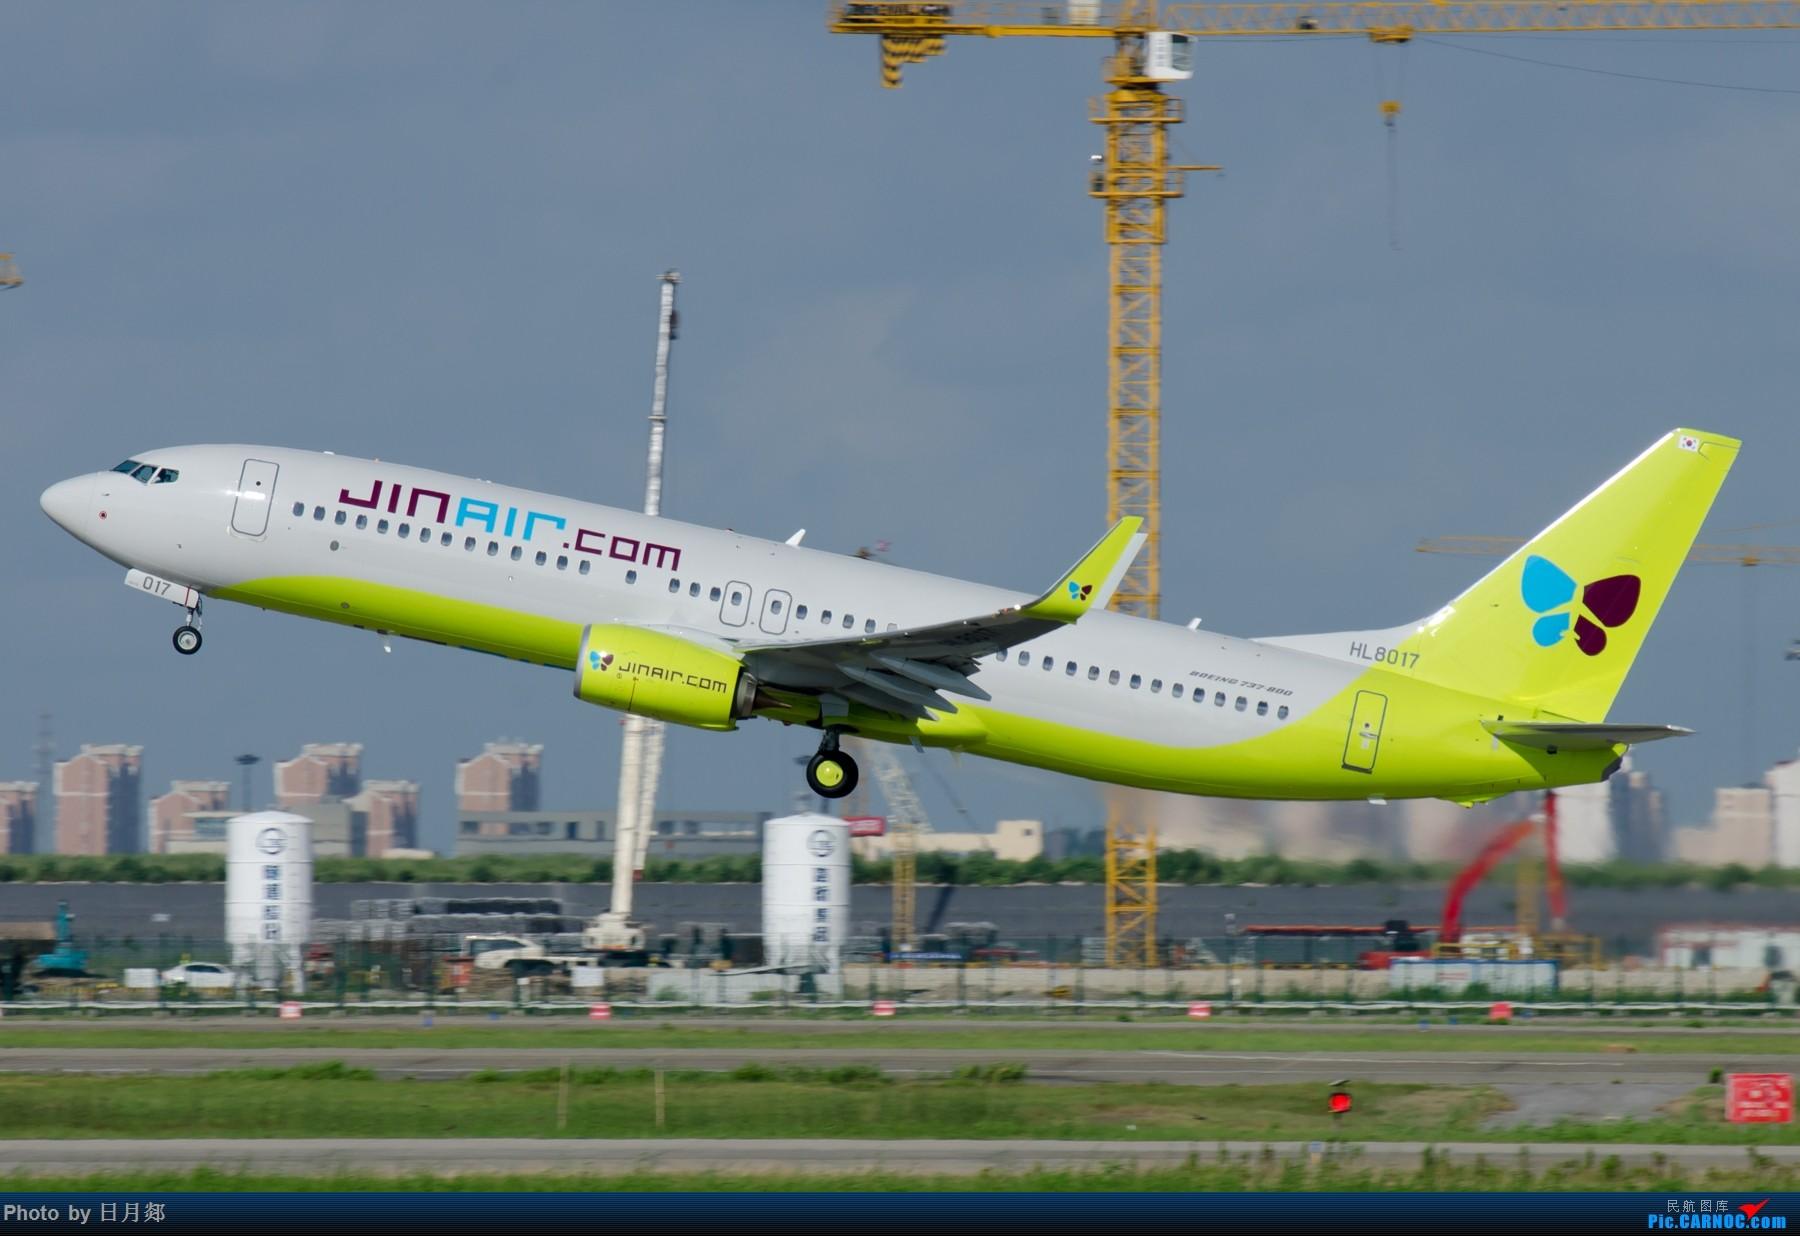 Re:[原创]一年起的最早的一次,PVG撒欢! BOEING 737-800 HL8017 中国上海浦东国际机场